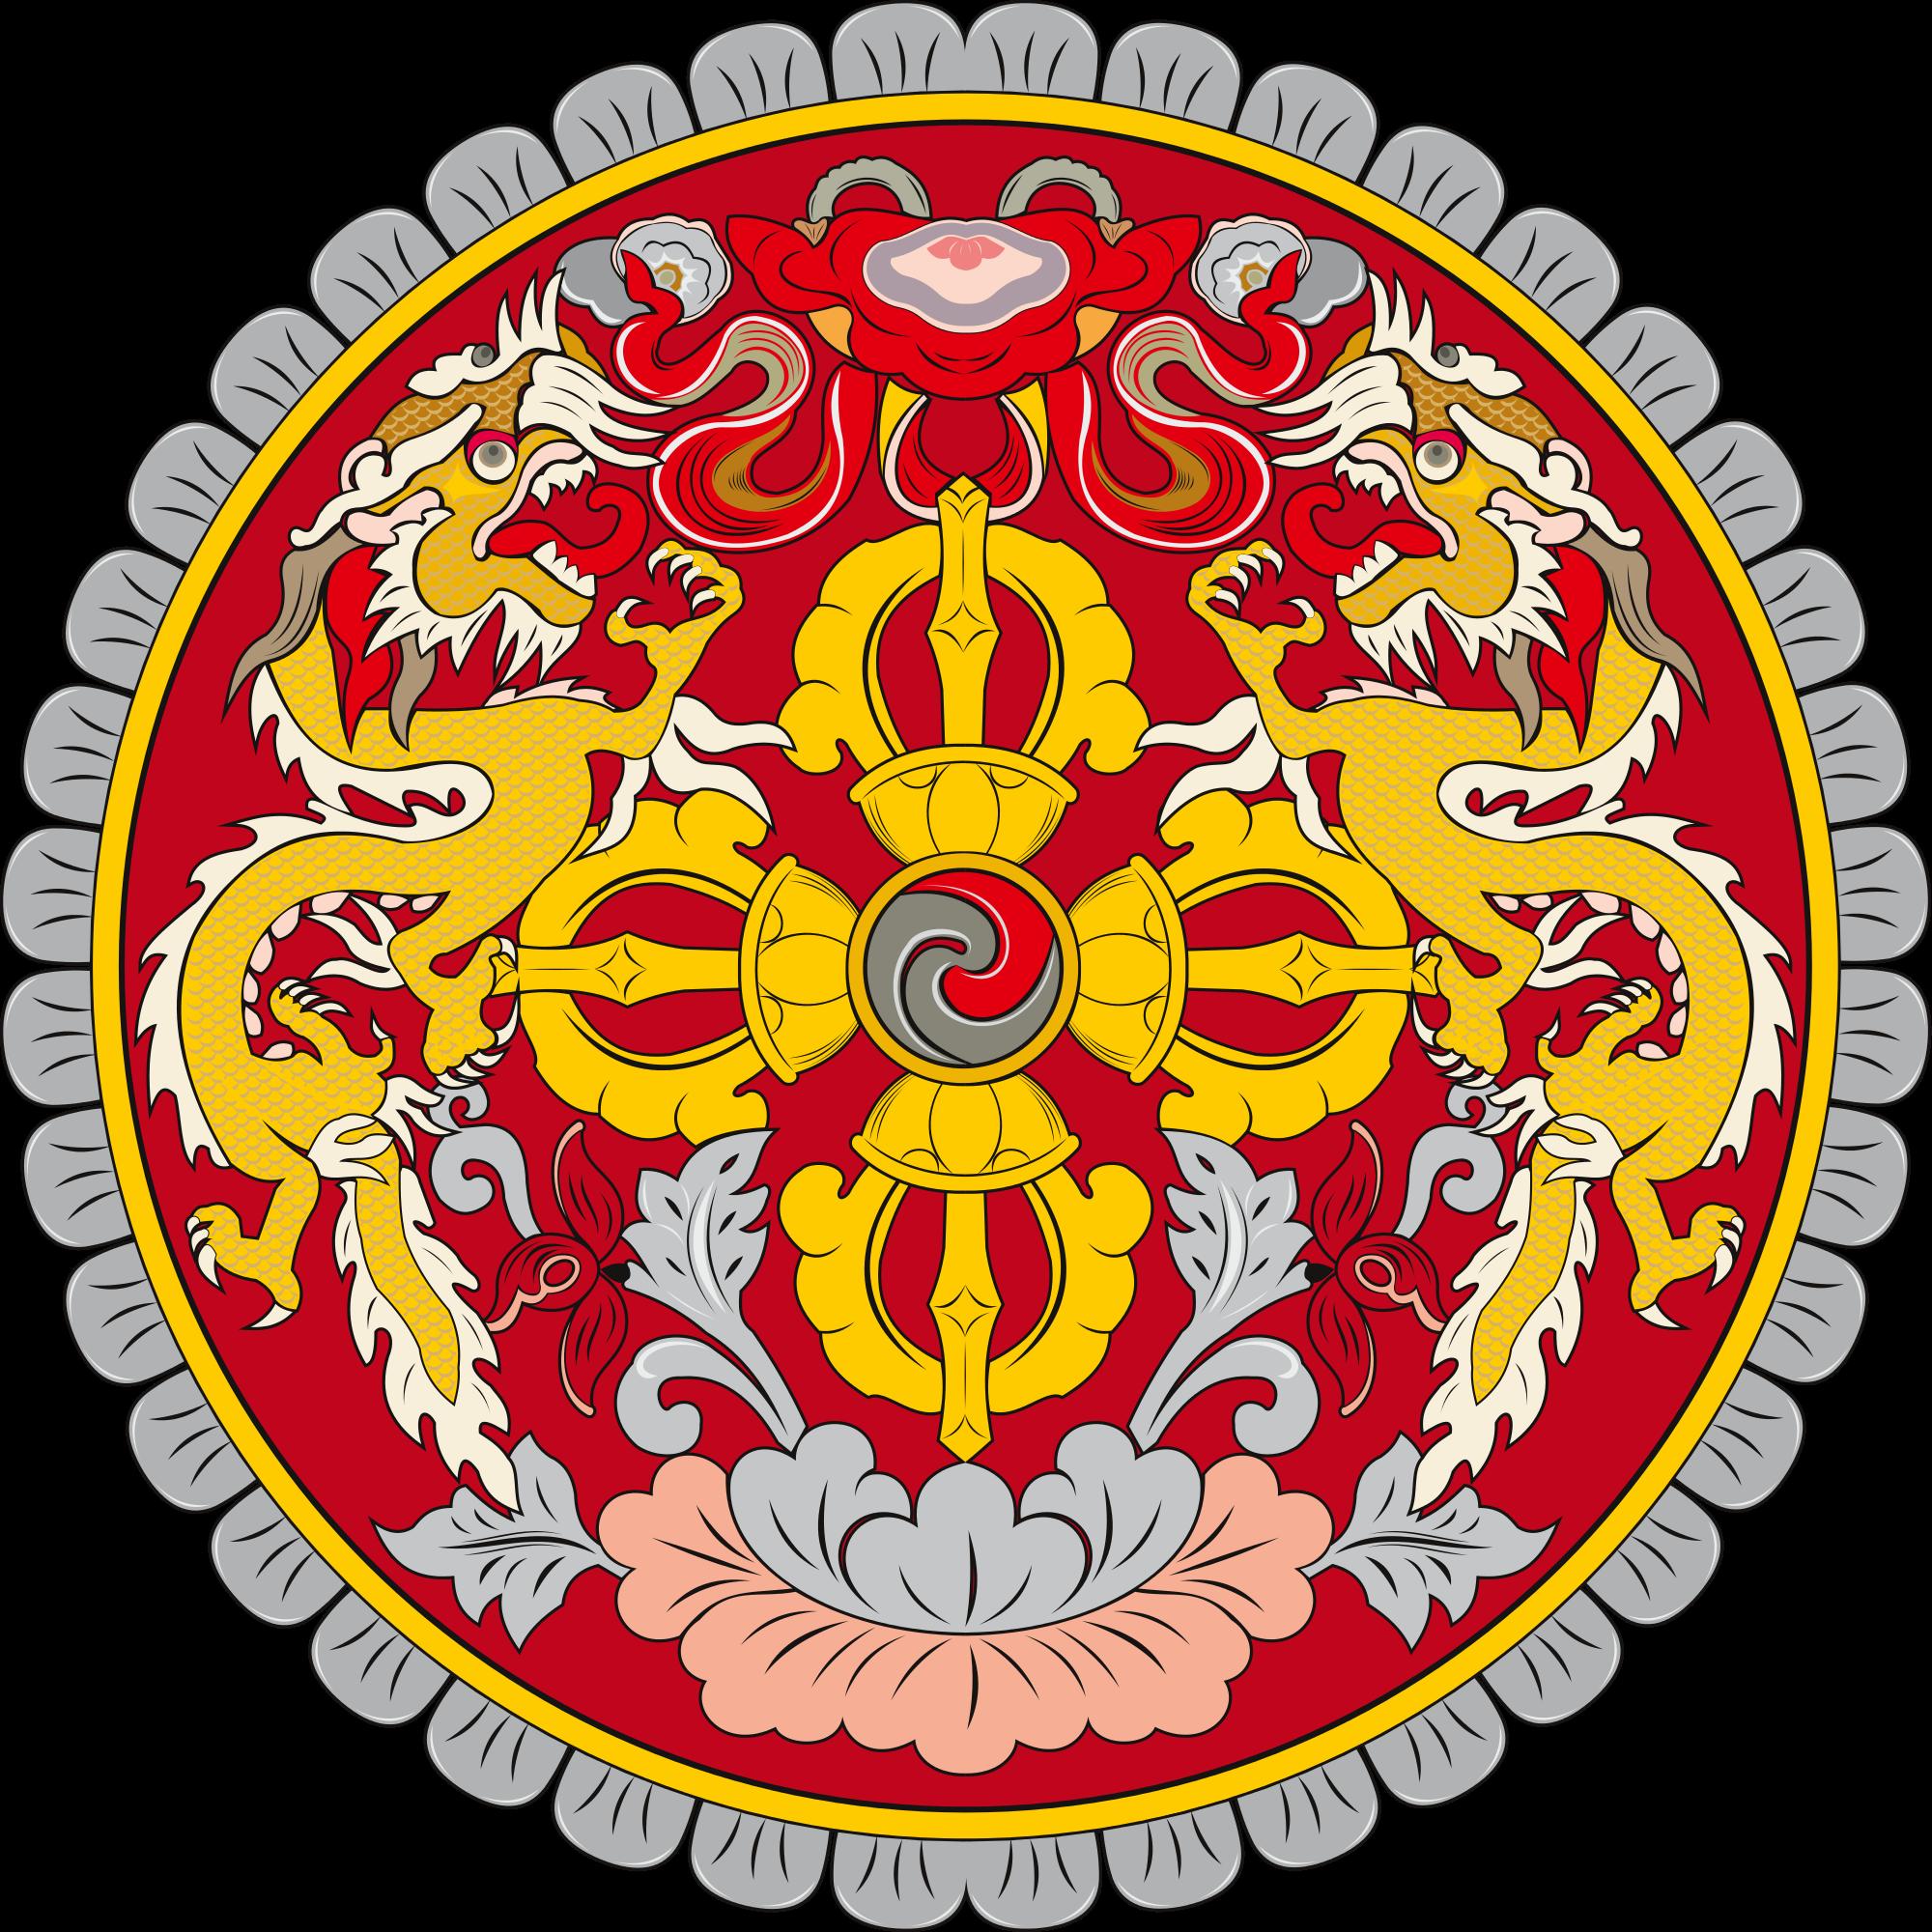 Bután (MNI)